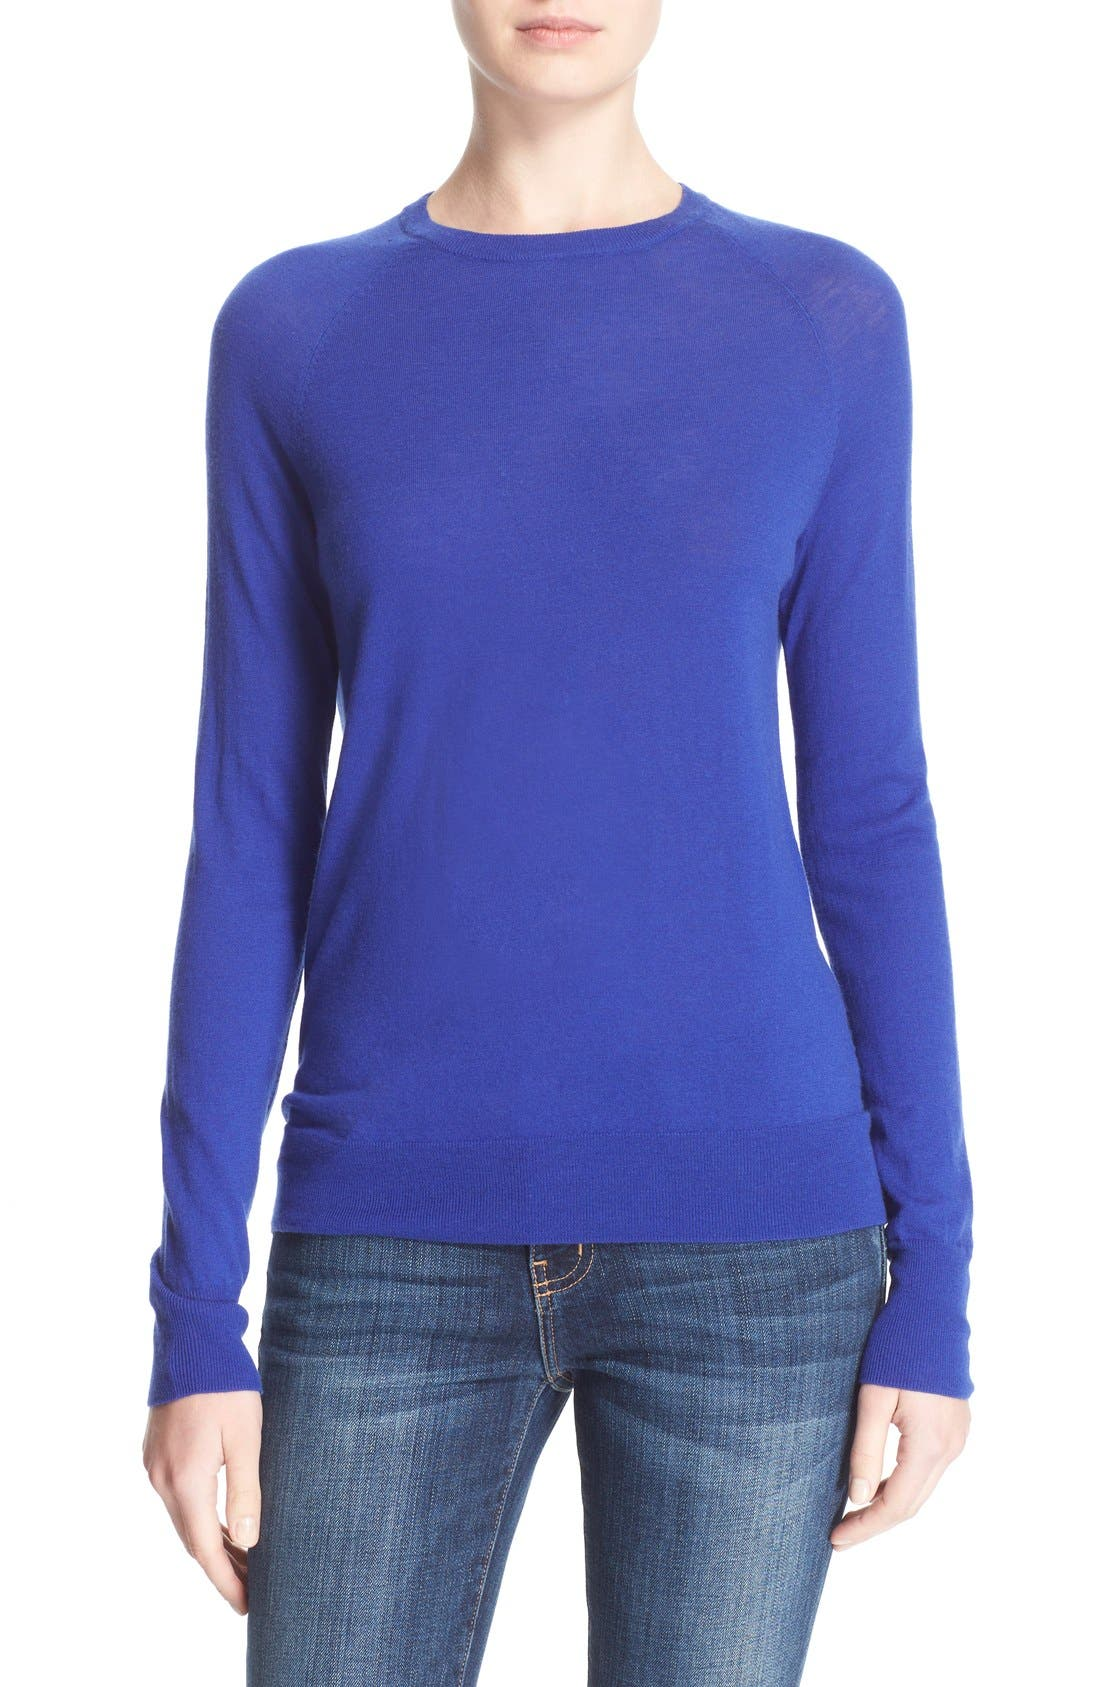 Main Image - Equipment 'Sloane' Crewneck Sweater